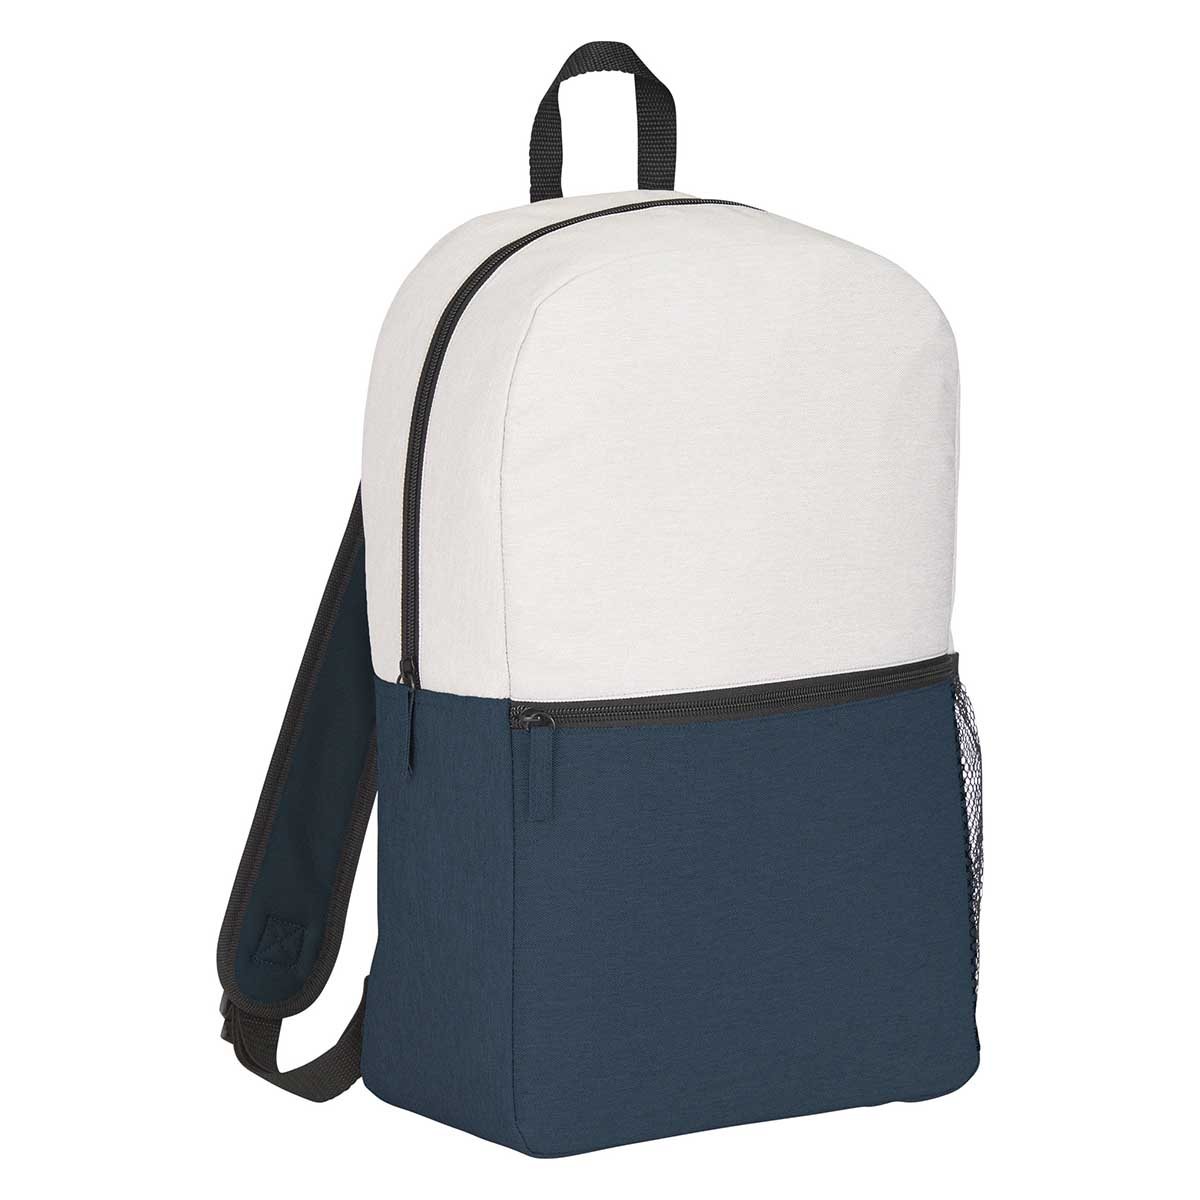 Navybackpack